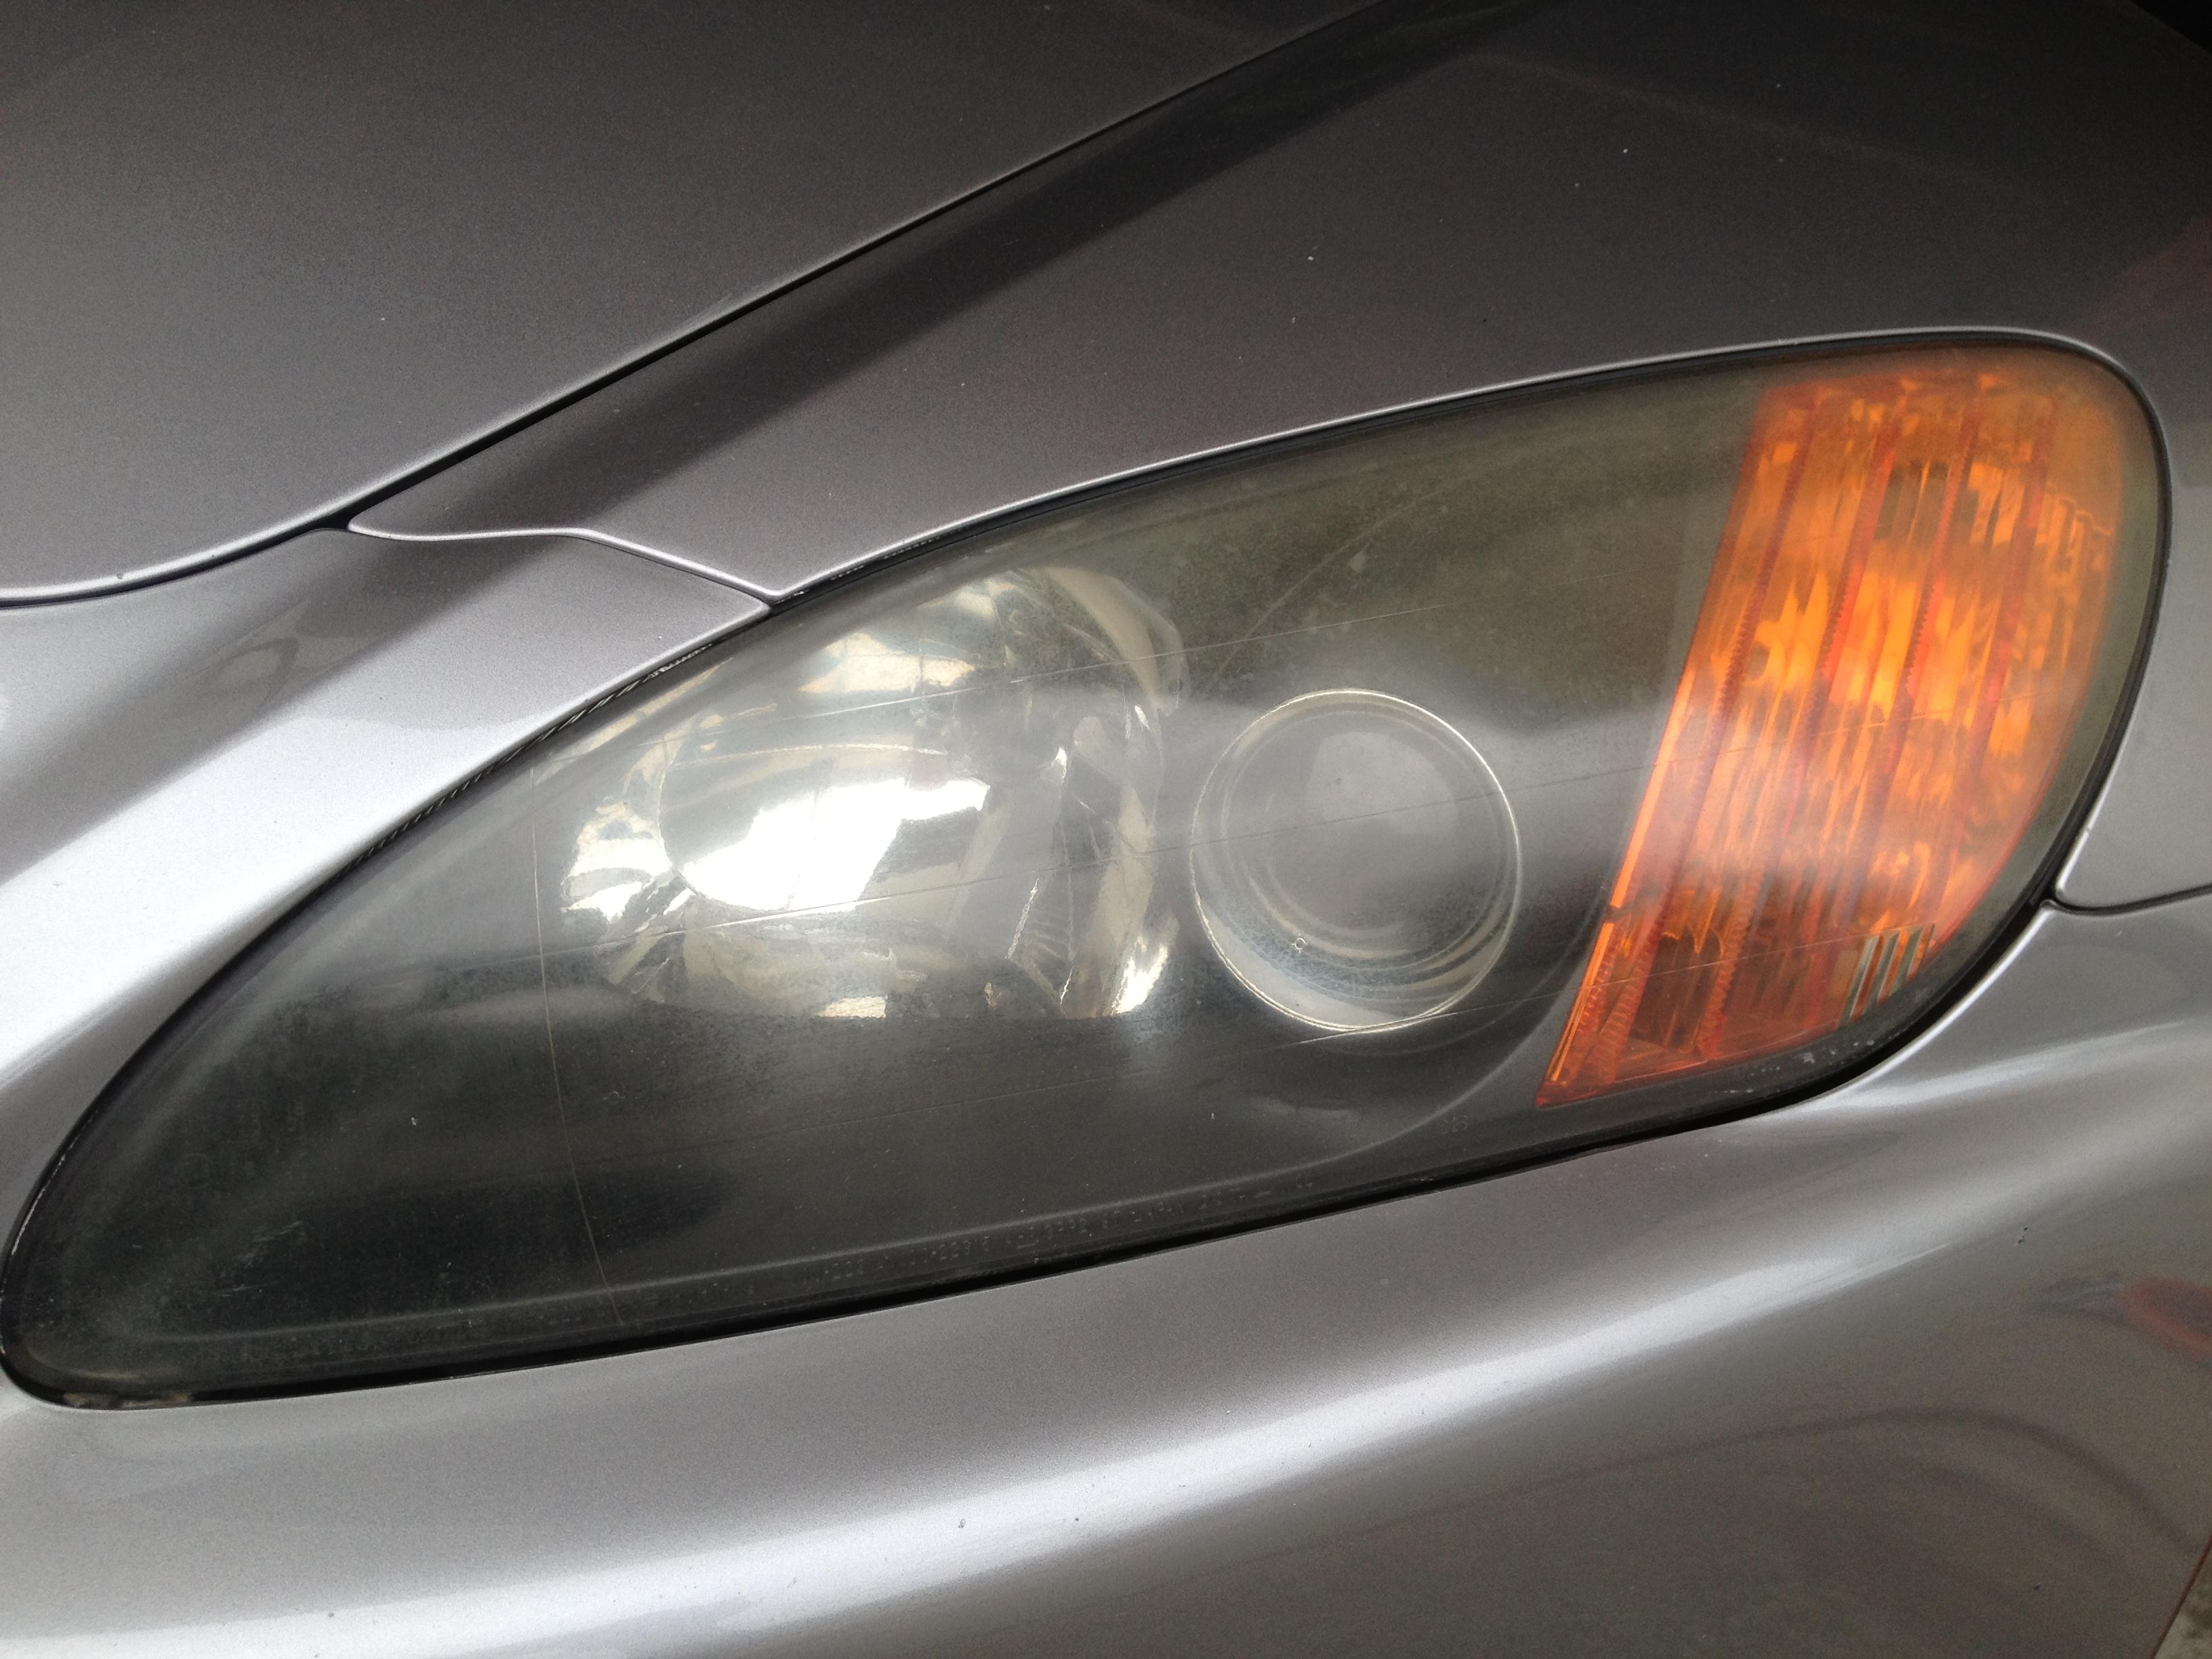 S2000 Headlight Restoration